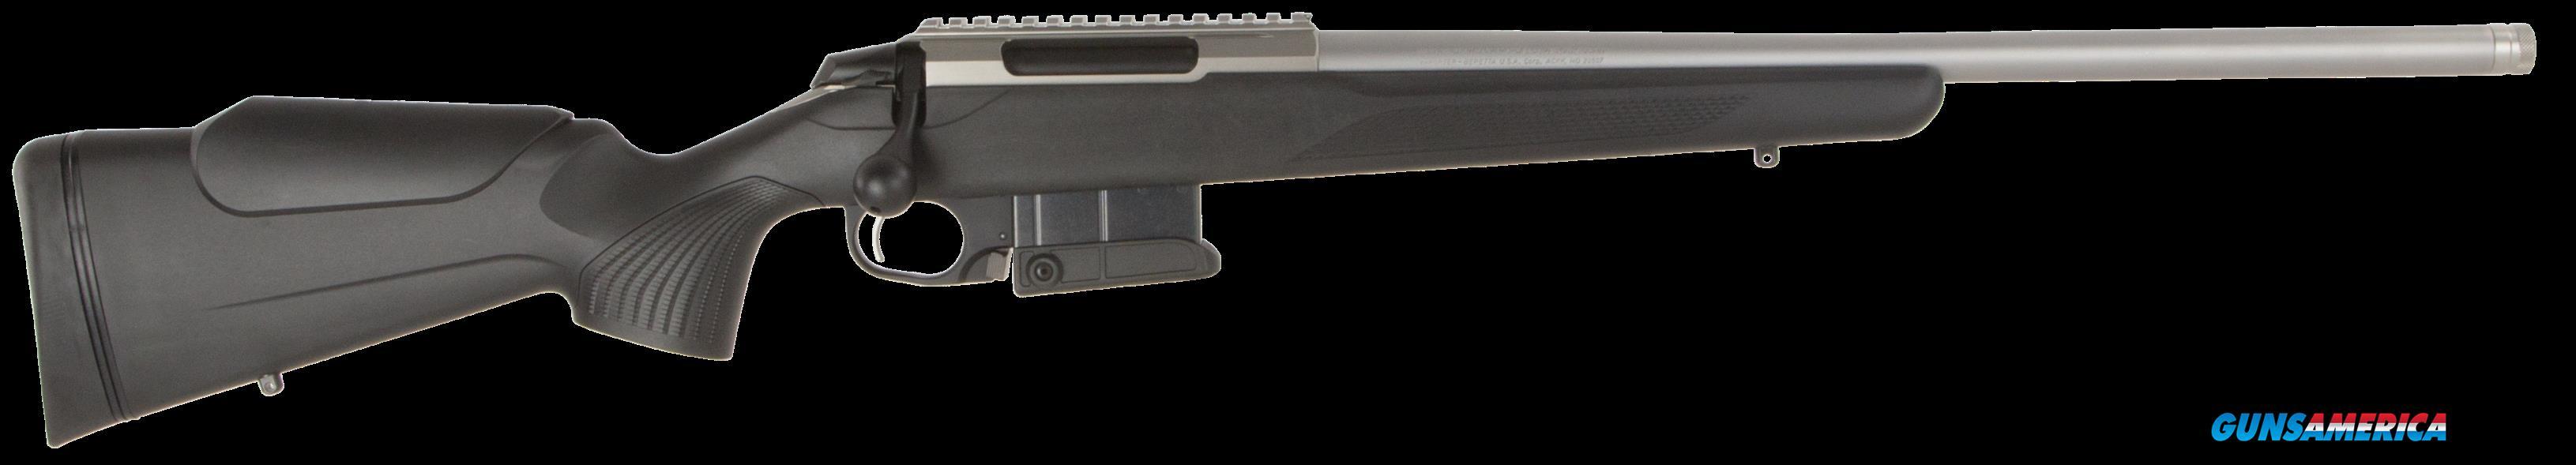 Tikka T3 T3x, Tikka Jrtxc382cas T3x Ctr    6.5crd   Ss  Guns > Pistols > 1911 Pistol Copies (non-Colt)